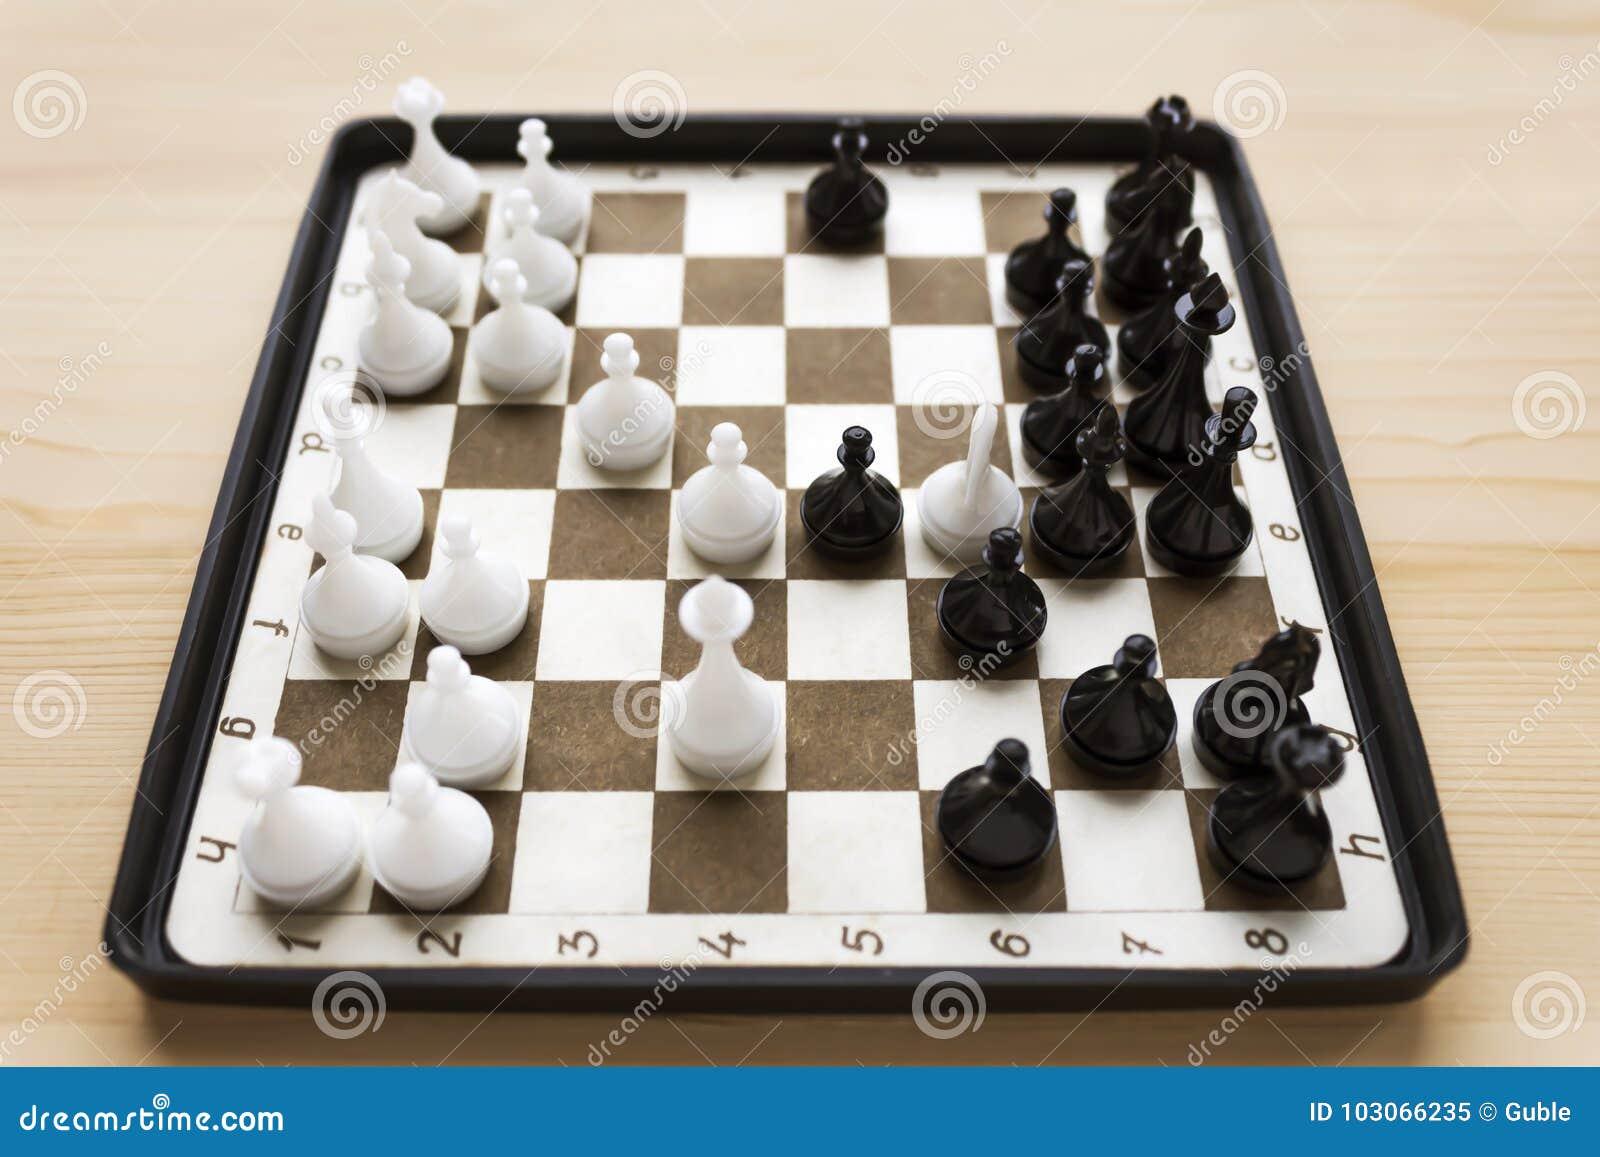 Download wallpaper 2780x2780 chess, snowman, figures, pawns, chess.